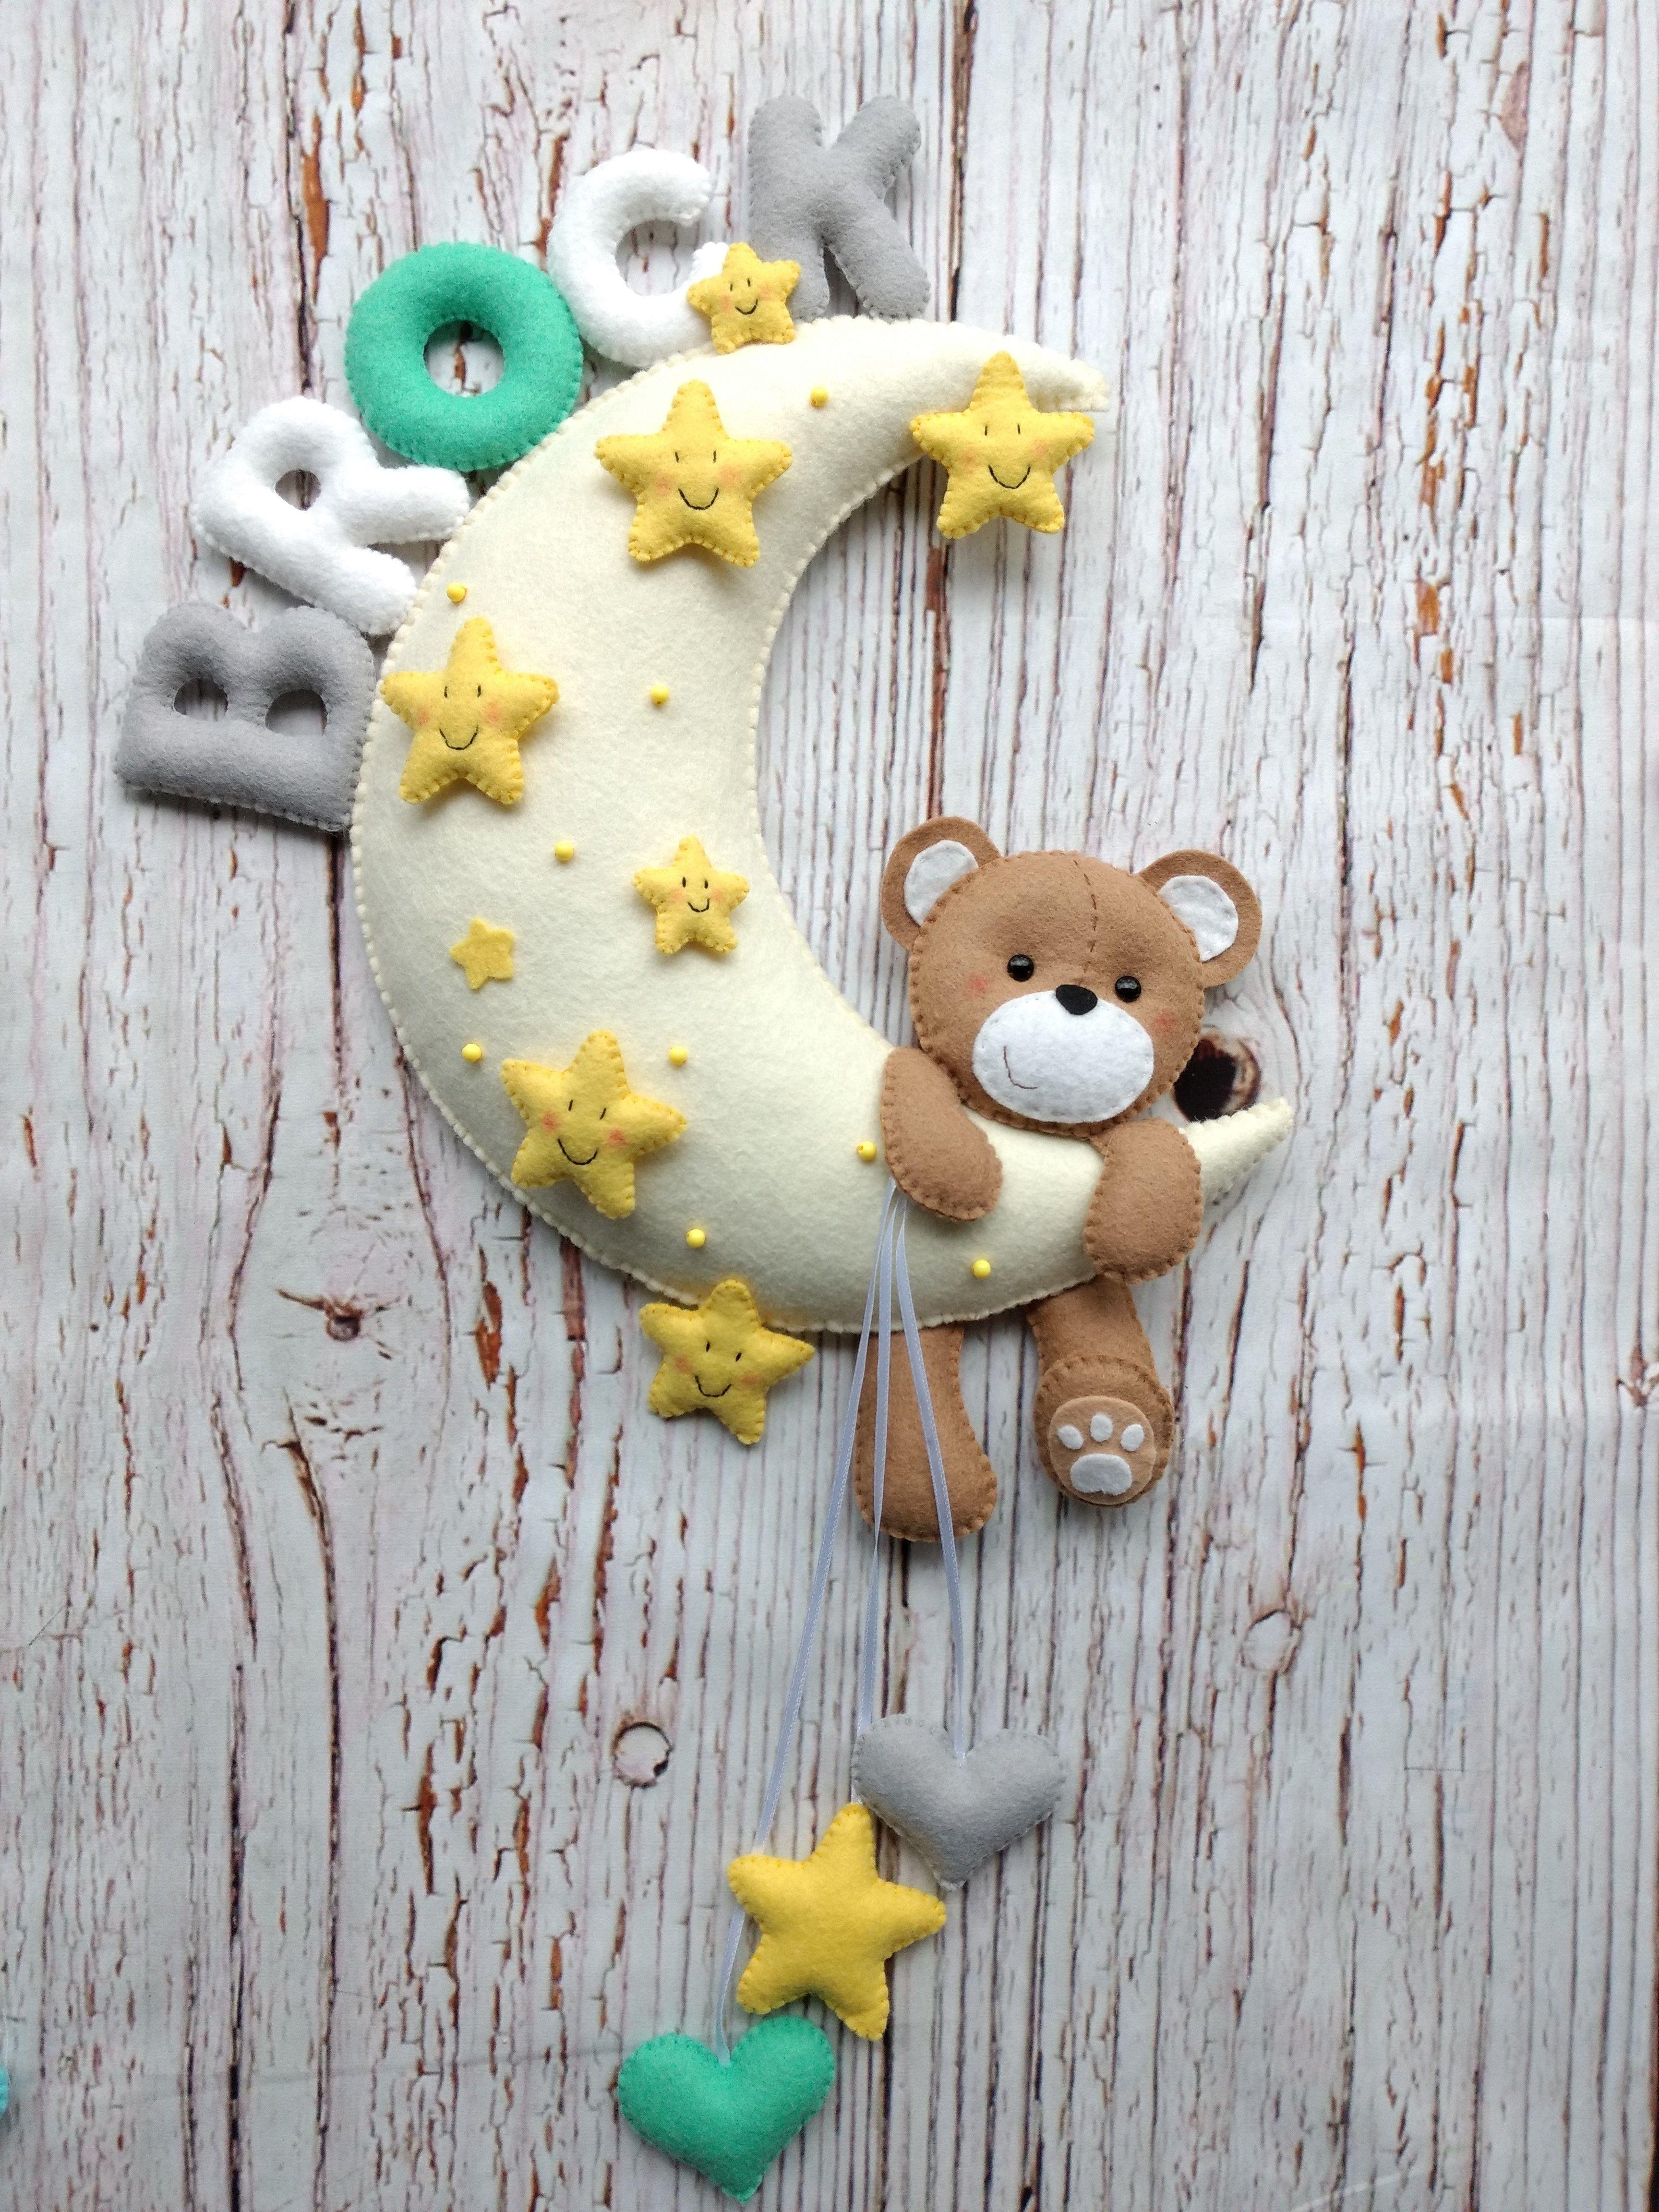 Baby Room Decor Personalized Felt Moon Teddy Bear Handmade Felt Hanging Door Decoration Nursery Wall Hanging Bear On The Moon Felt Decor Felt Decorations Baby Room Decor Handmade Felt